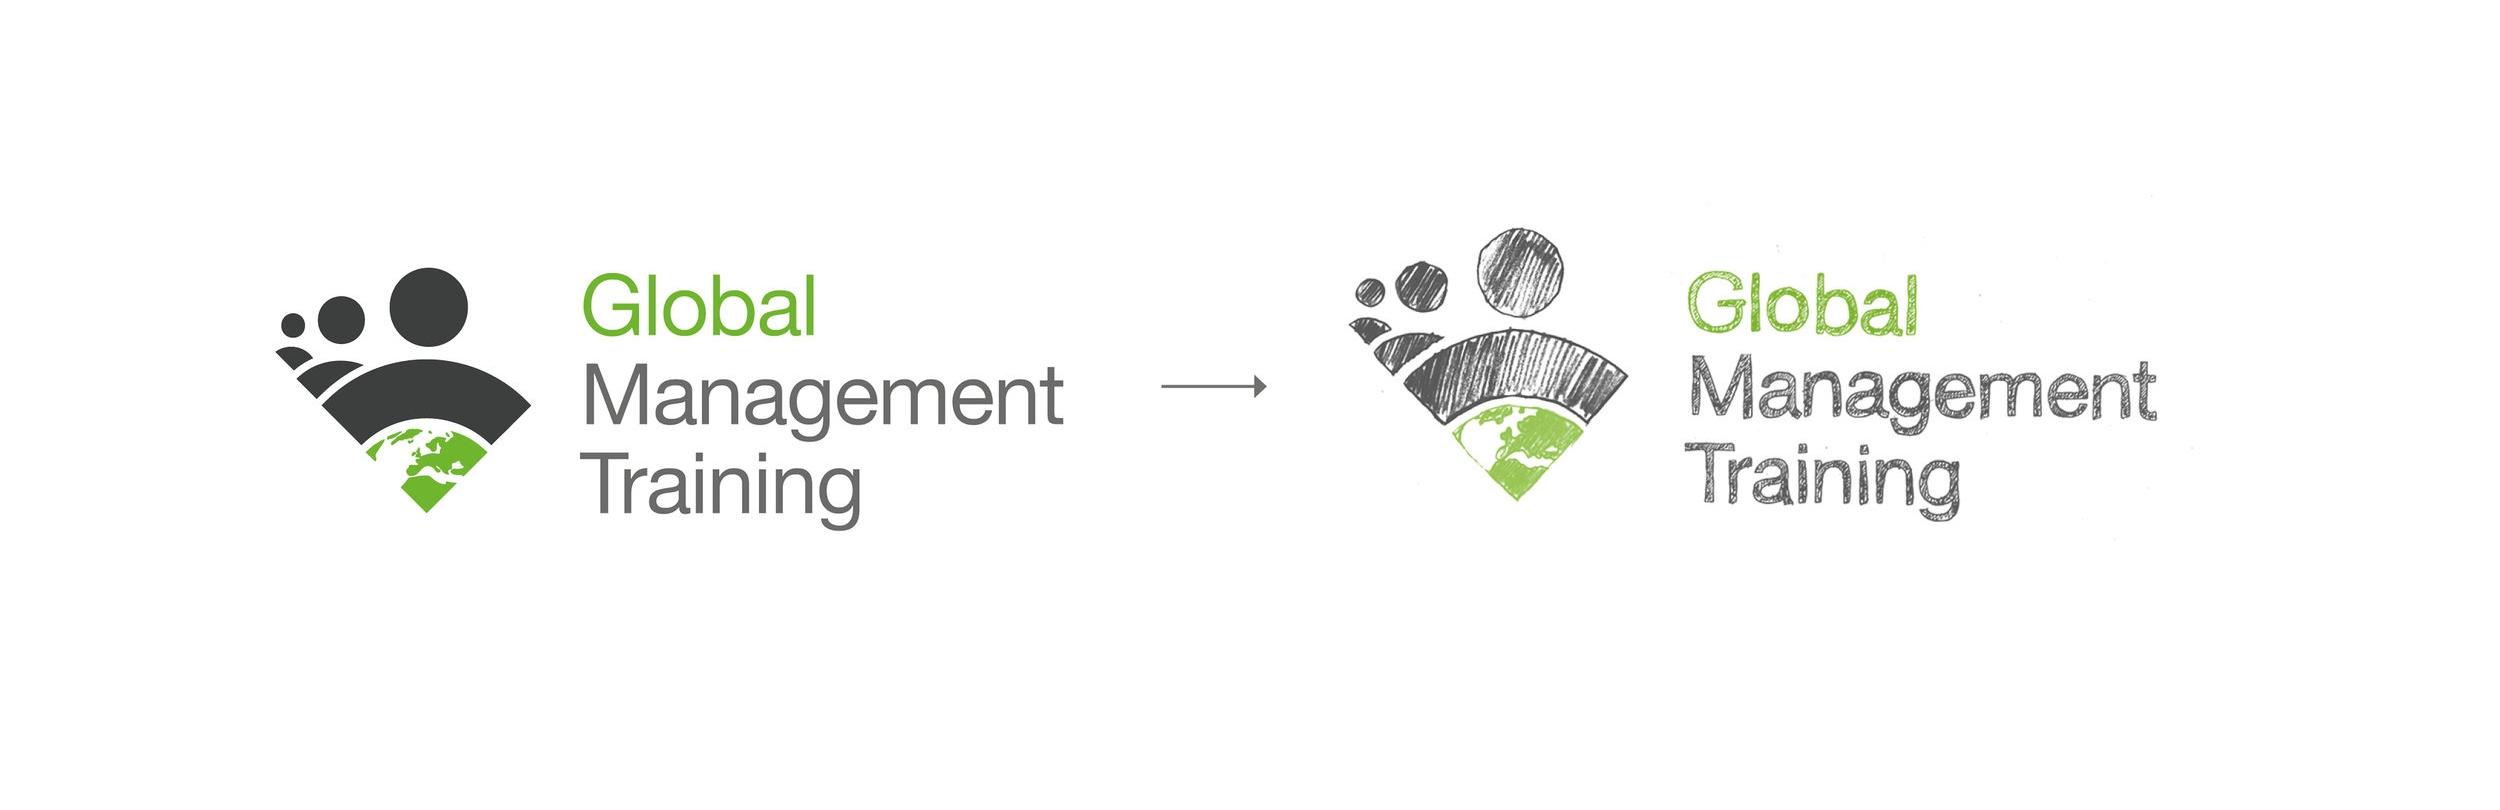 03-FS-Greenpeace-Logo-Presentation-16.jpg